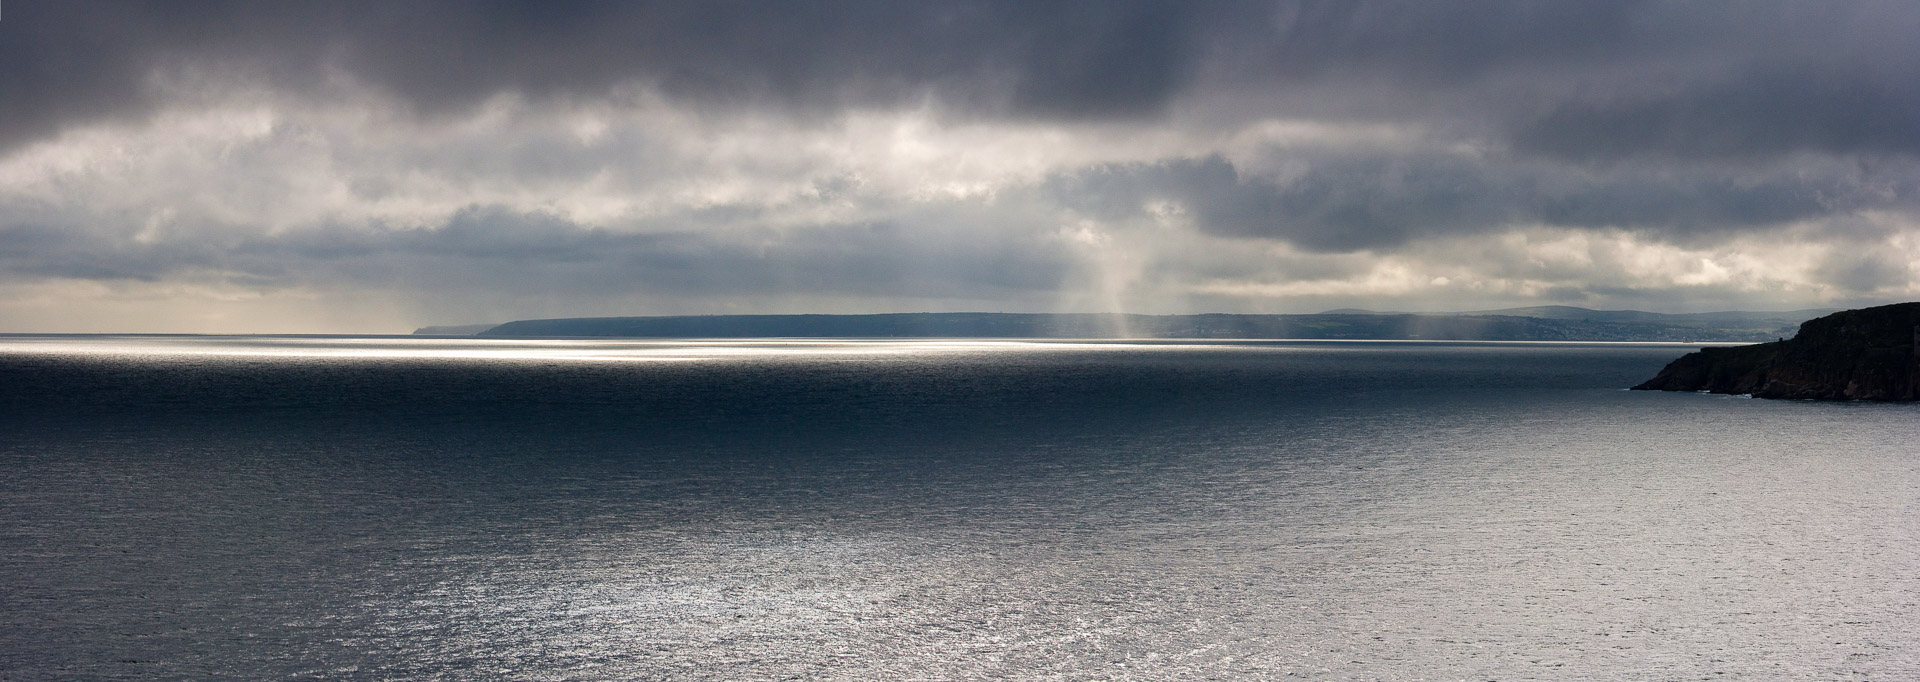 10.8. - Mounts Bay, Beacon Crag, Porthleven